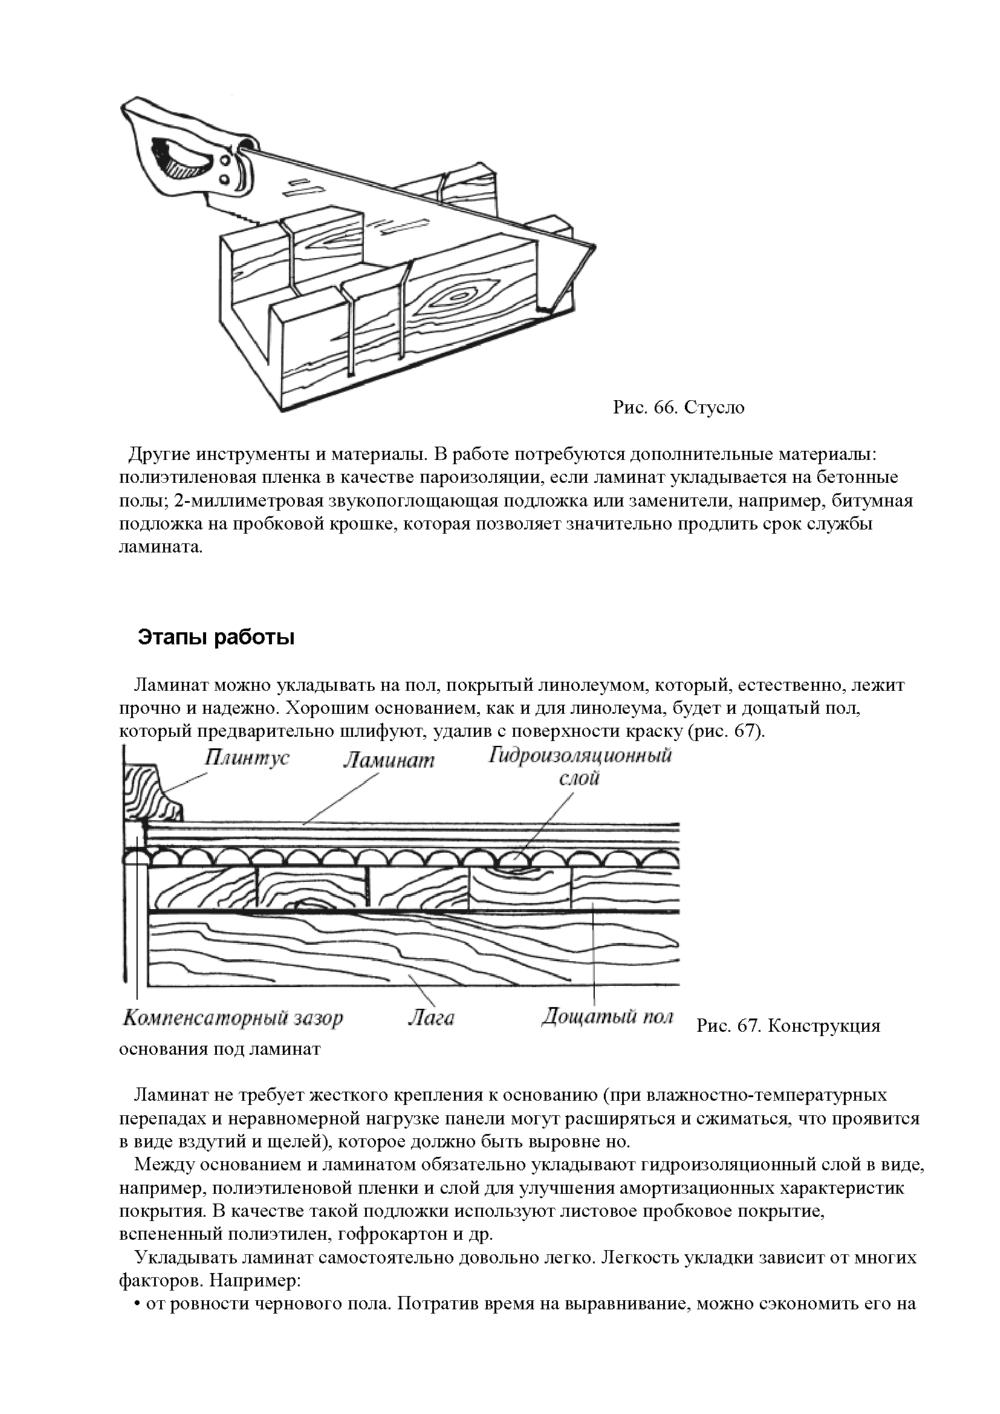 http://i1.imageban.ru/out/2013/11/26/44f1d17c3eb5f3eab02ab9b8657f12e1.jpg